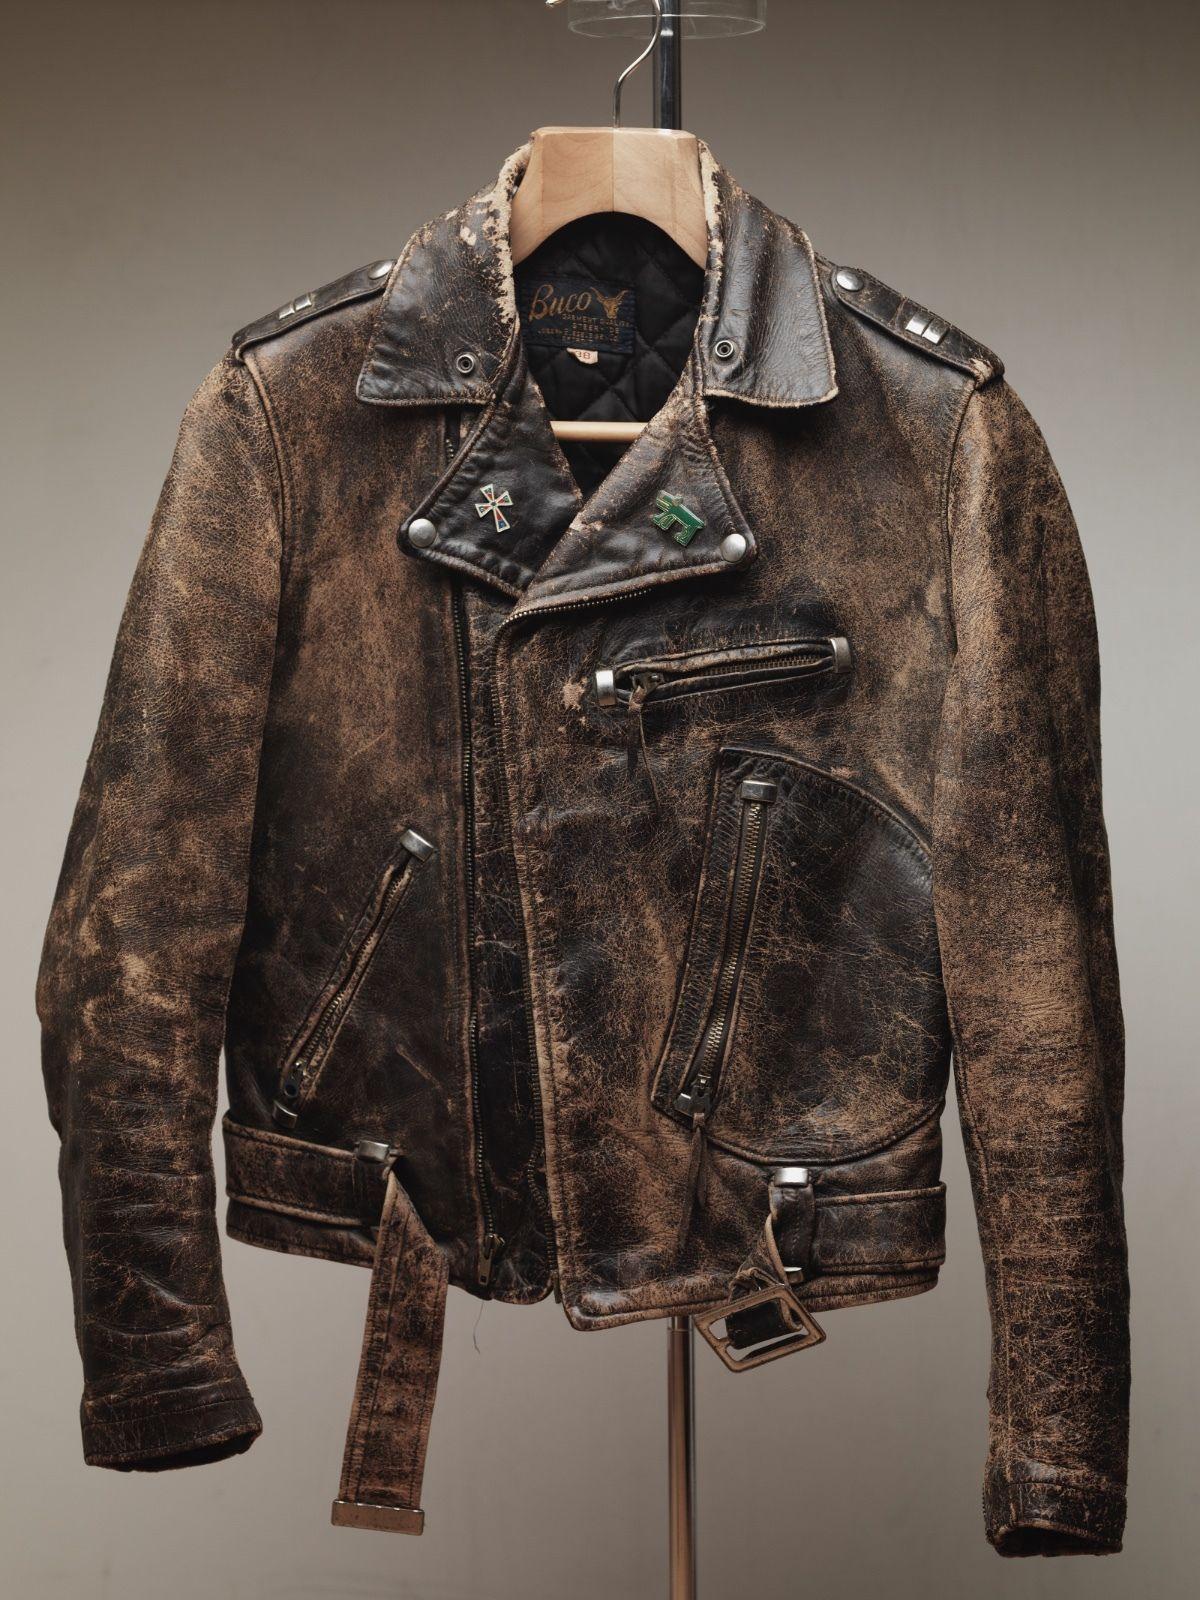 Real Mccoys Harley Cycle Champ Leather Horsehide Jacket 40 Elvis Presley Buco Leather Jacket Men Style Vintage Clothing Men Leather Jacket Style [ 1600 x 1200 Pixel ]